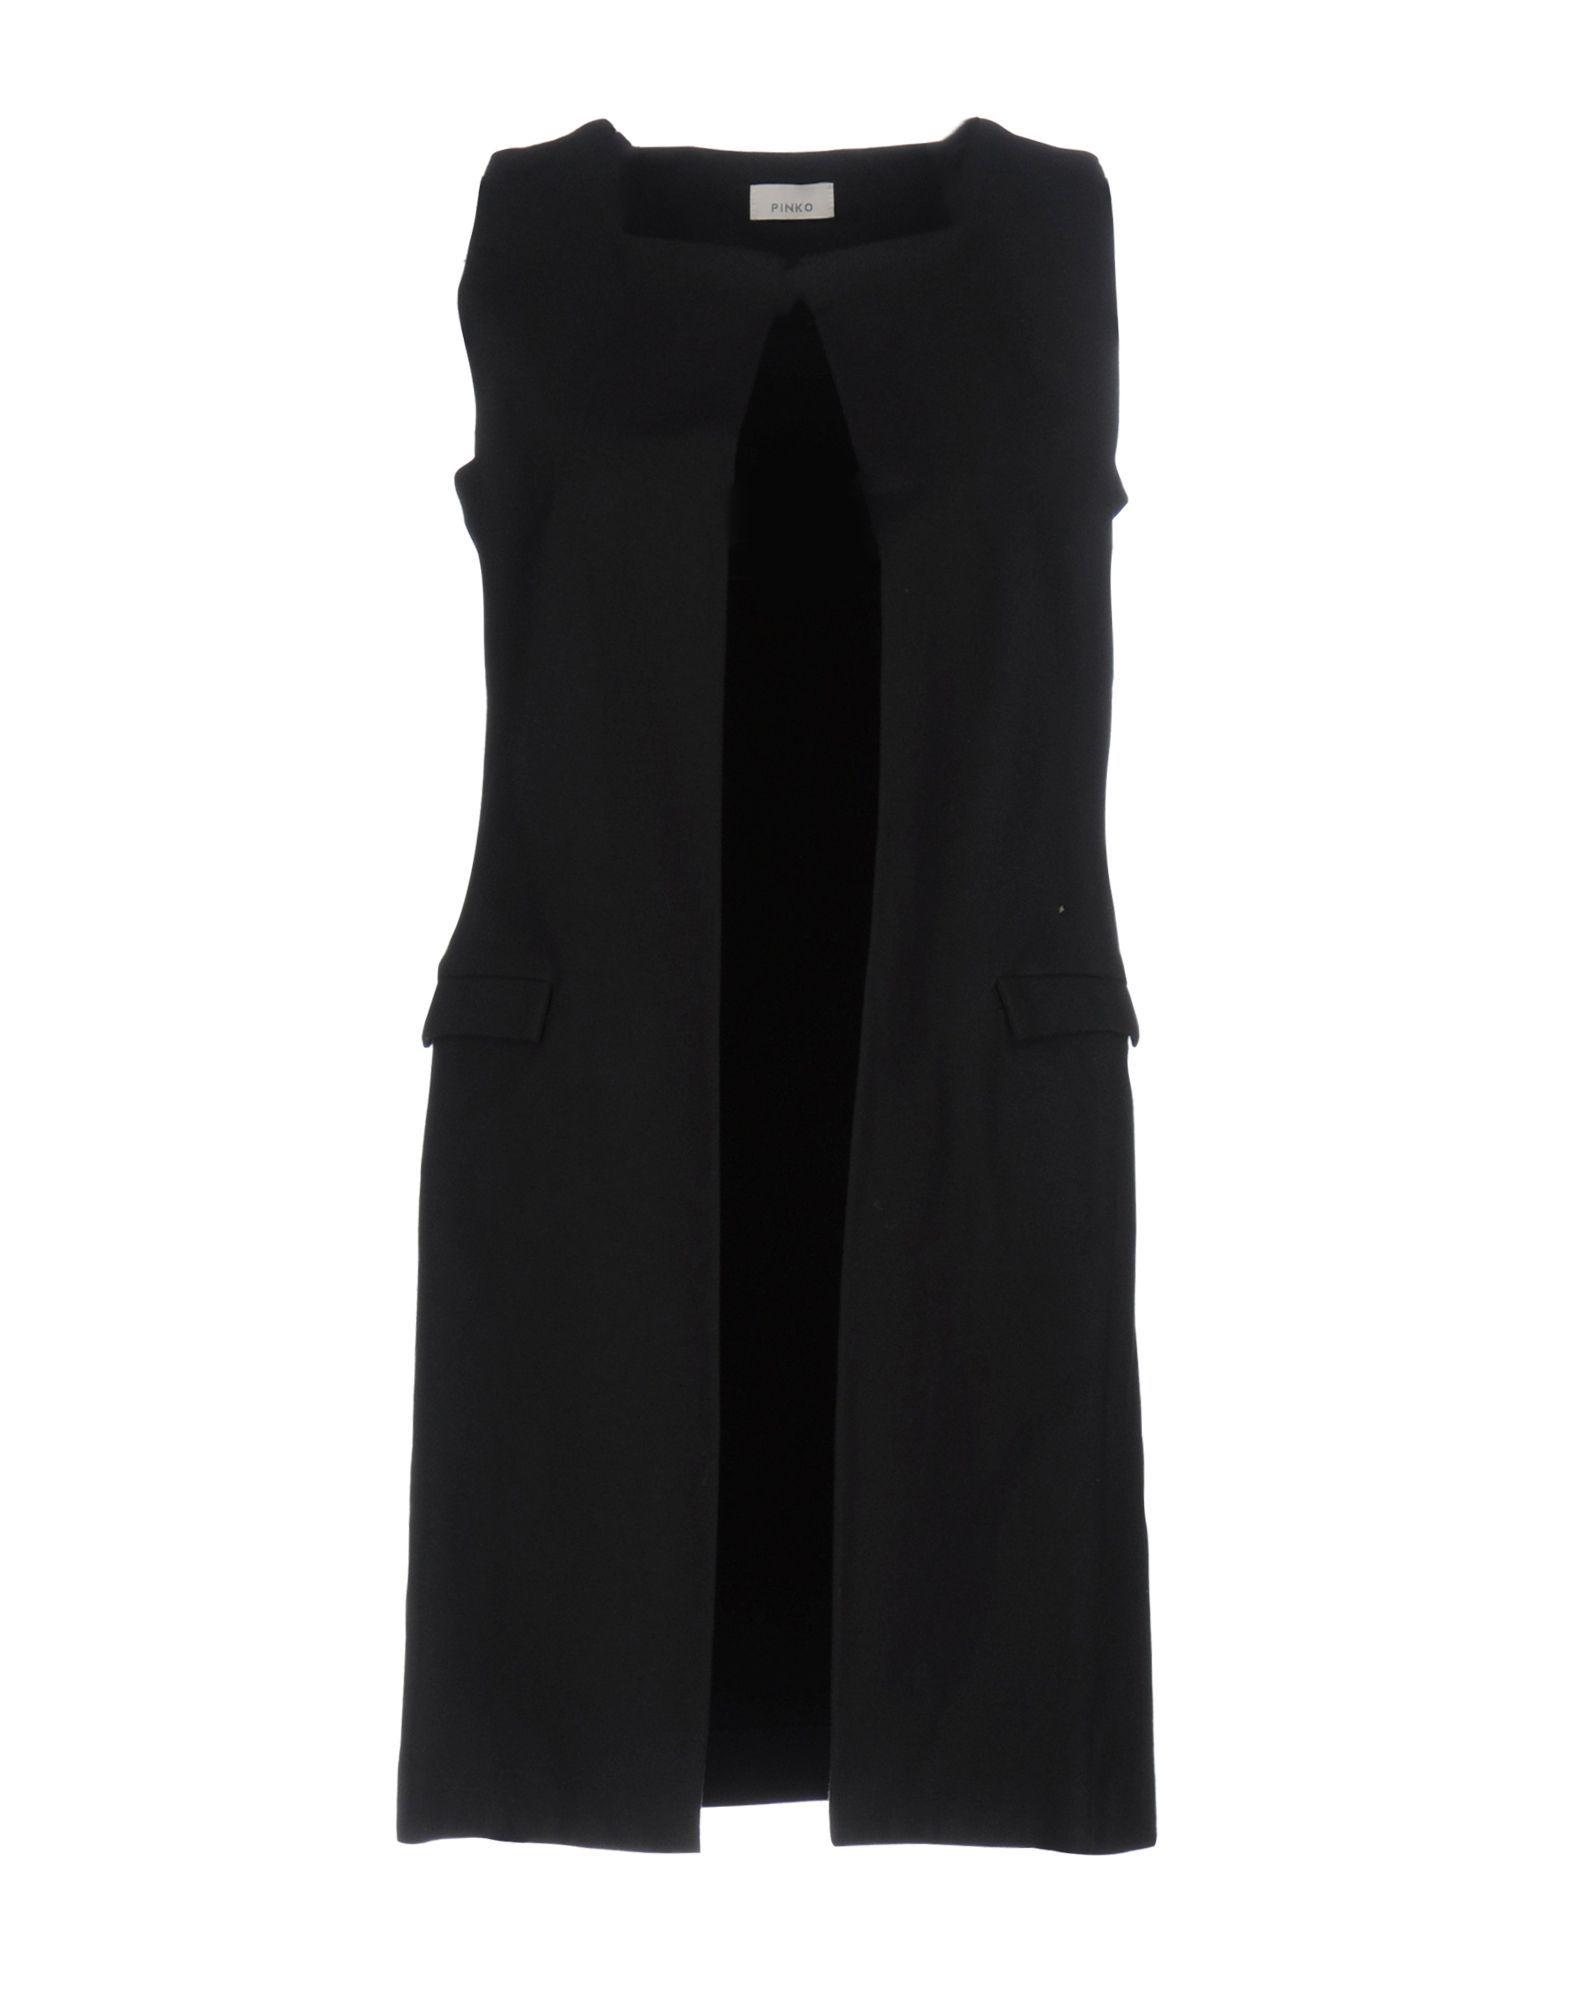 Pinko Black Wool Single Breasted Sleeveless Jacket